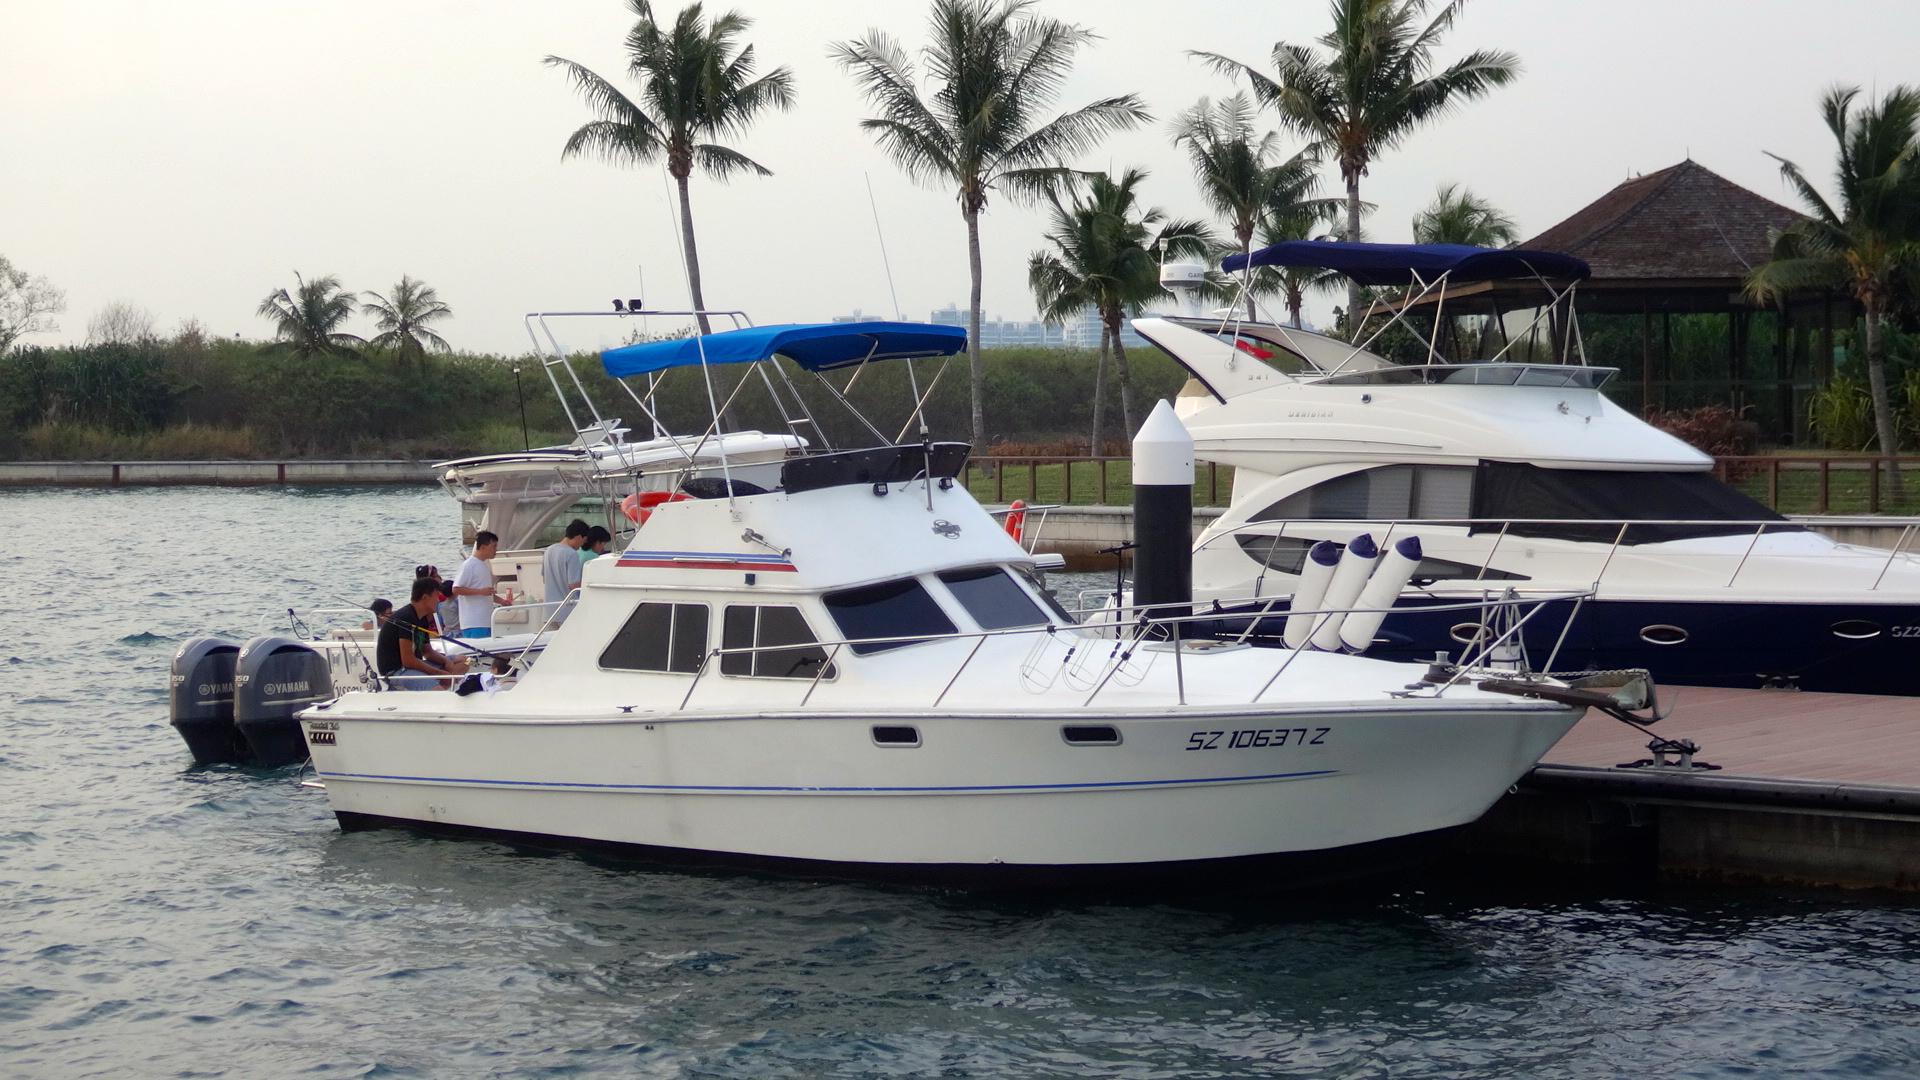 SZ10637Z berthed at St. John's dock. Nov 1, 2014.